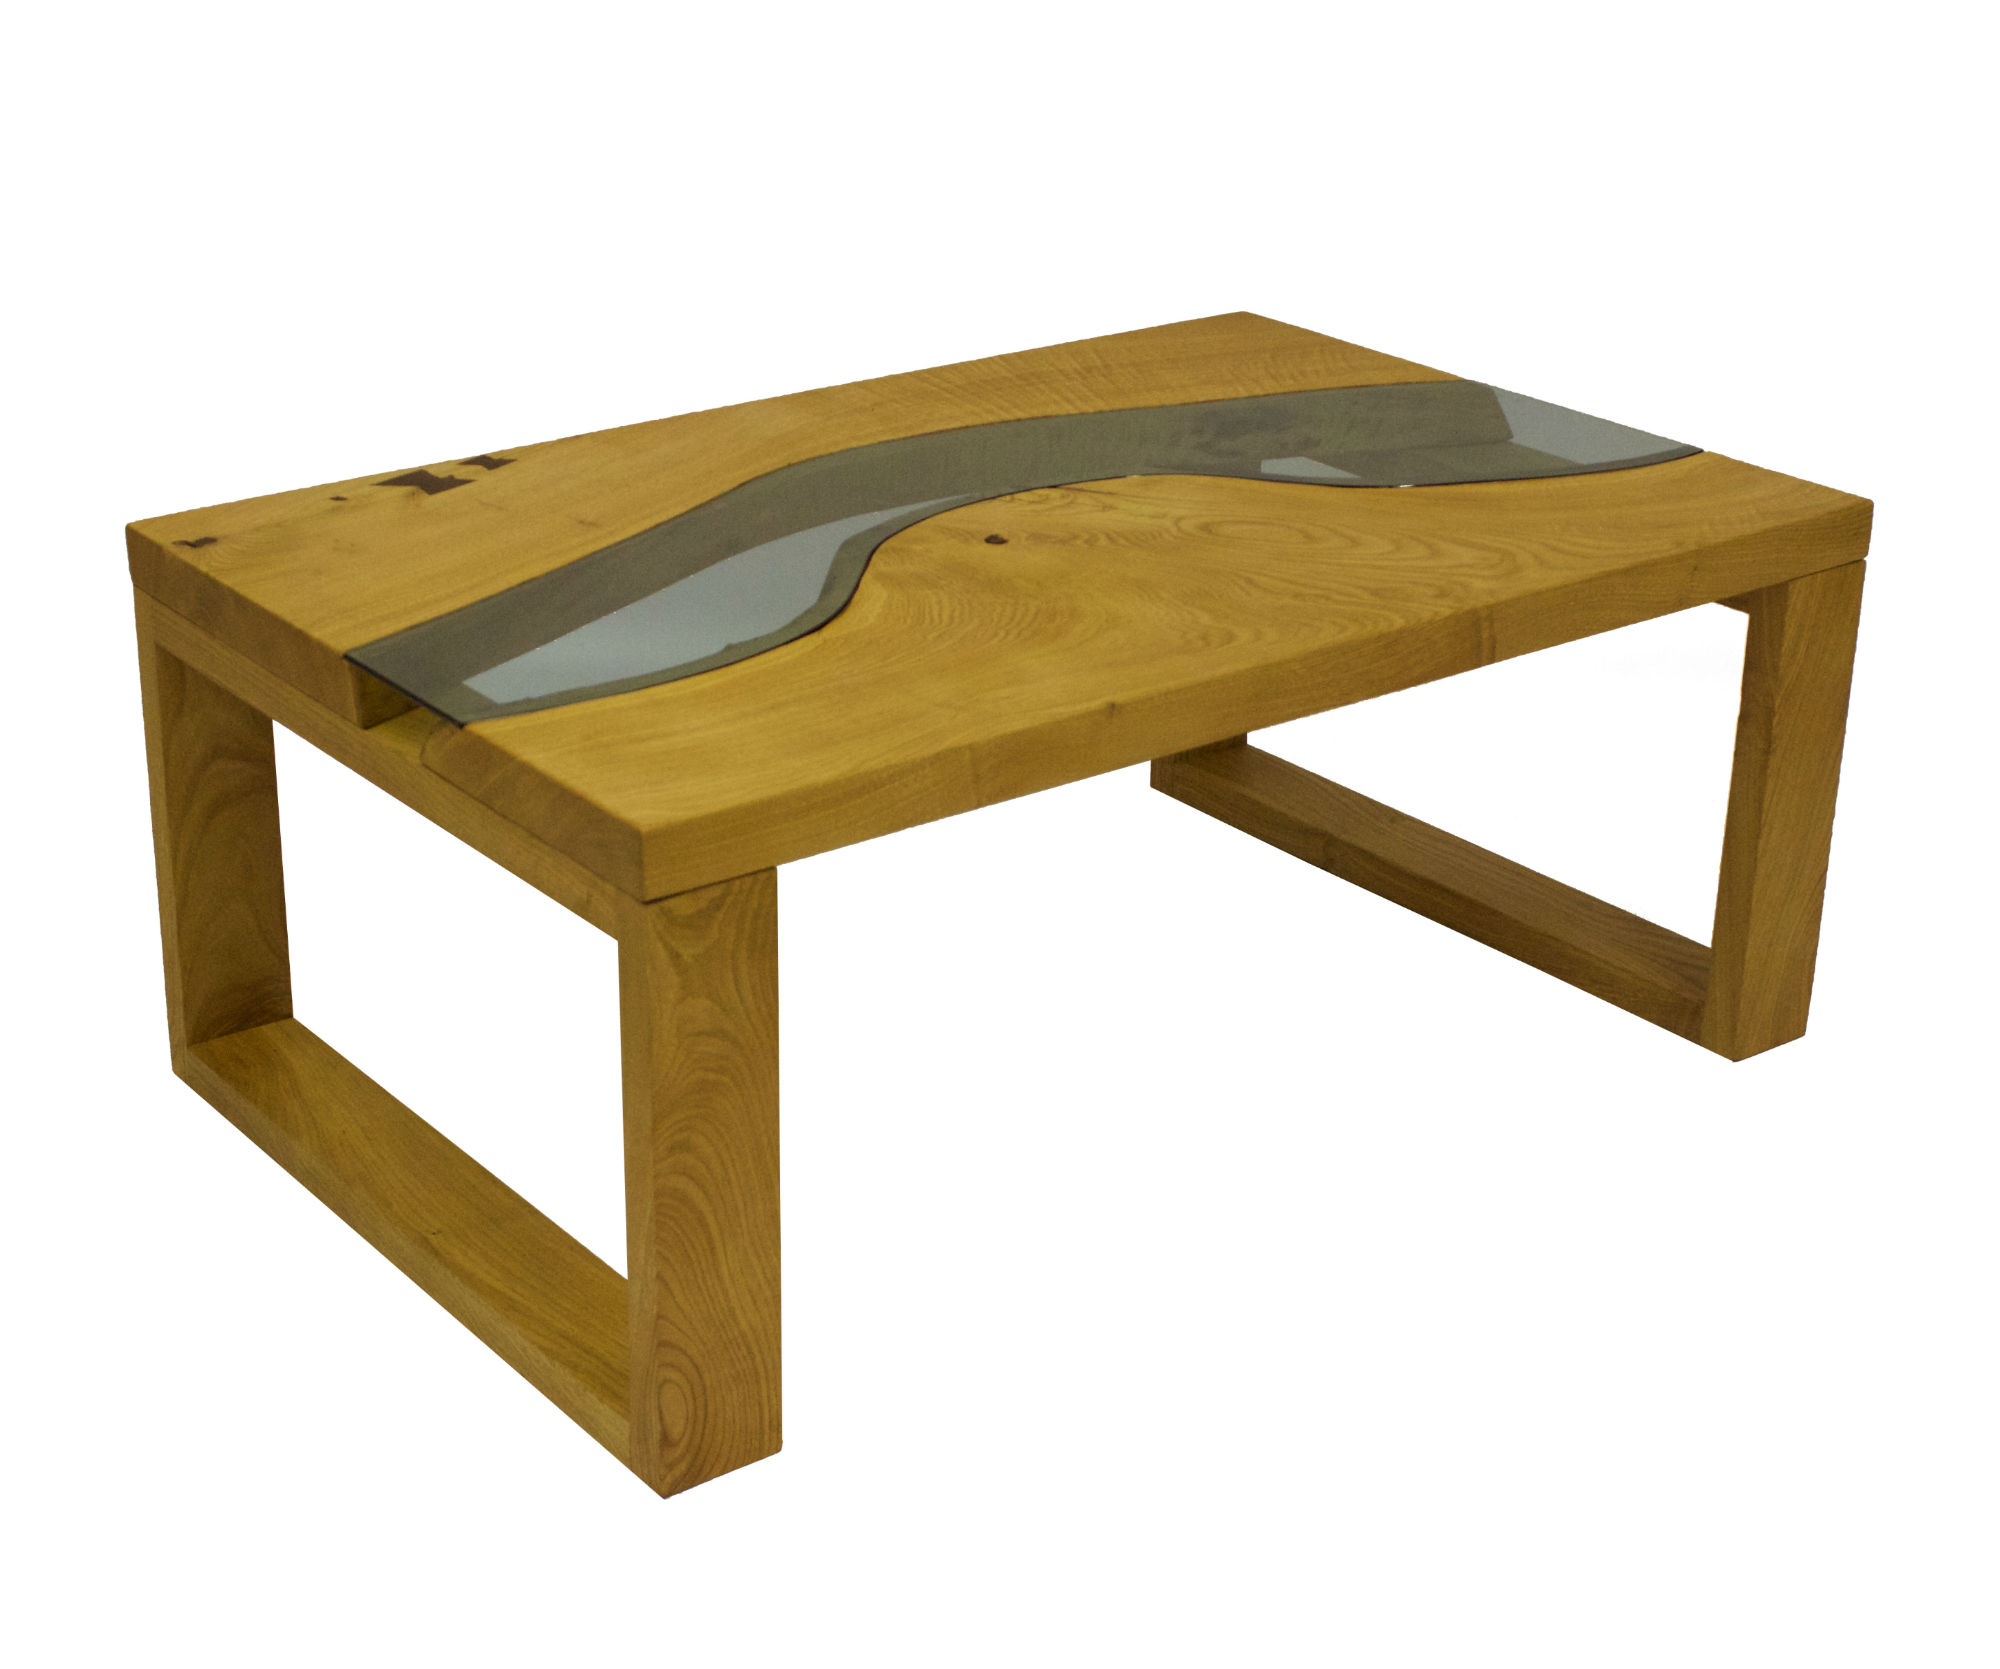 Chestnut stream table